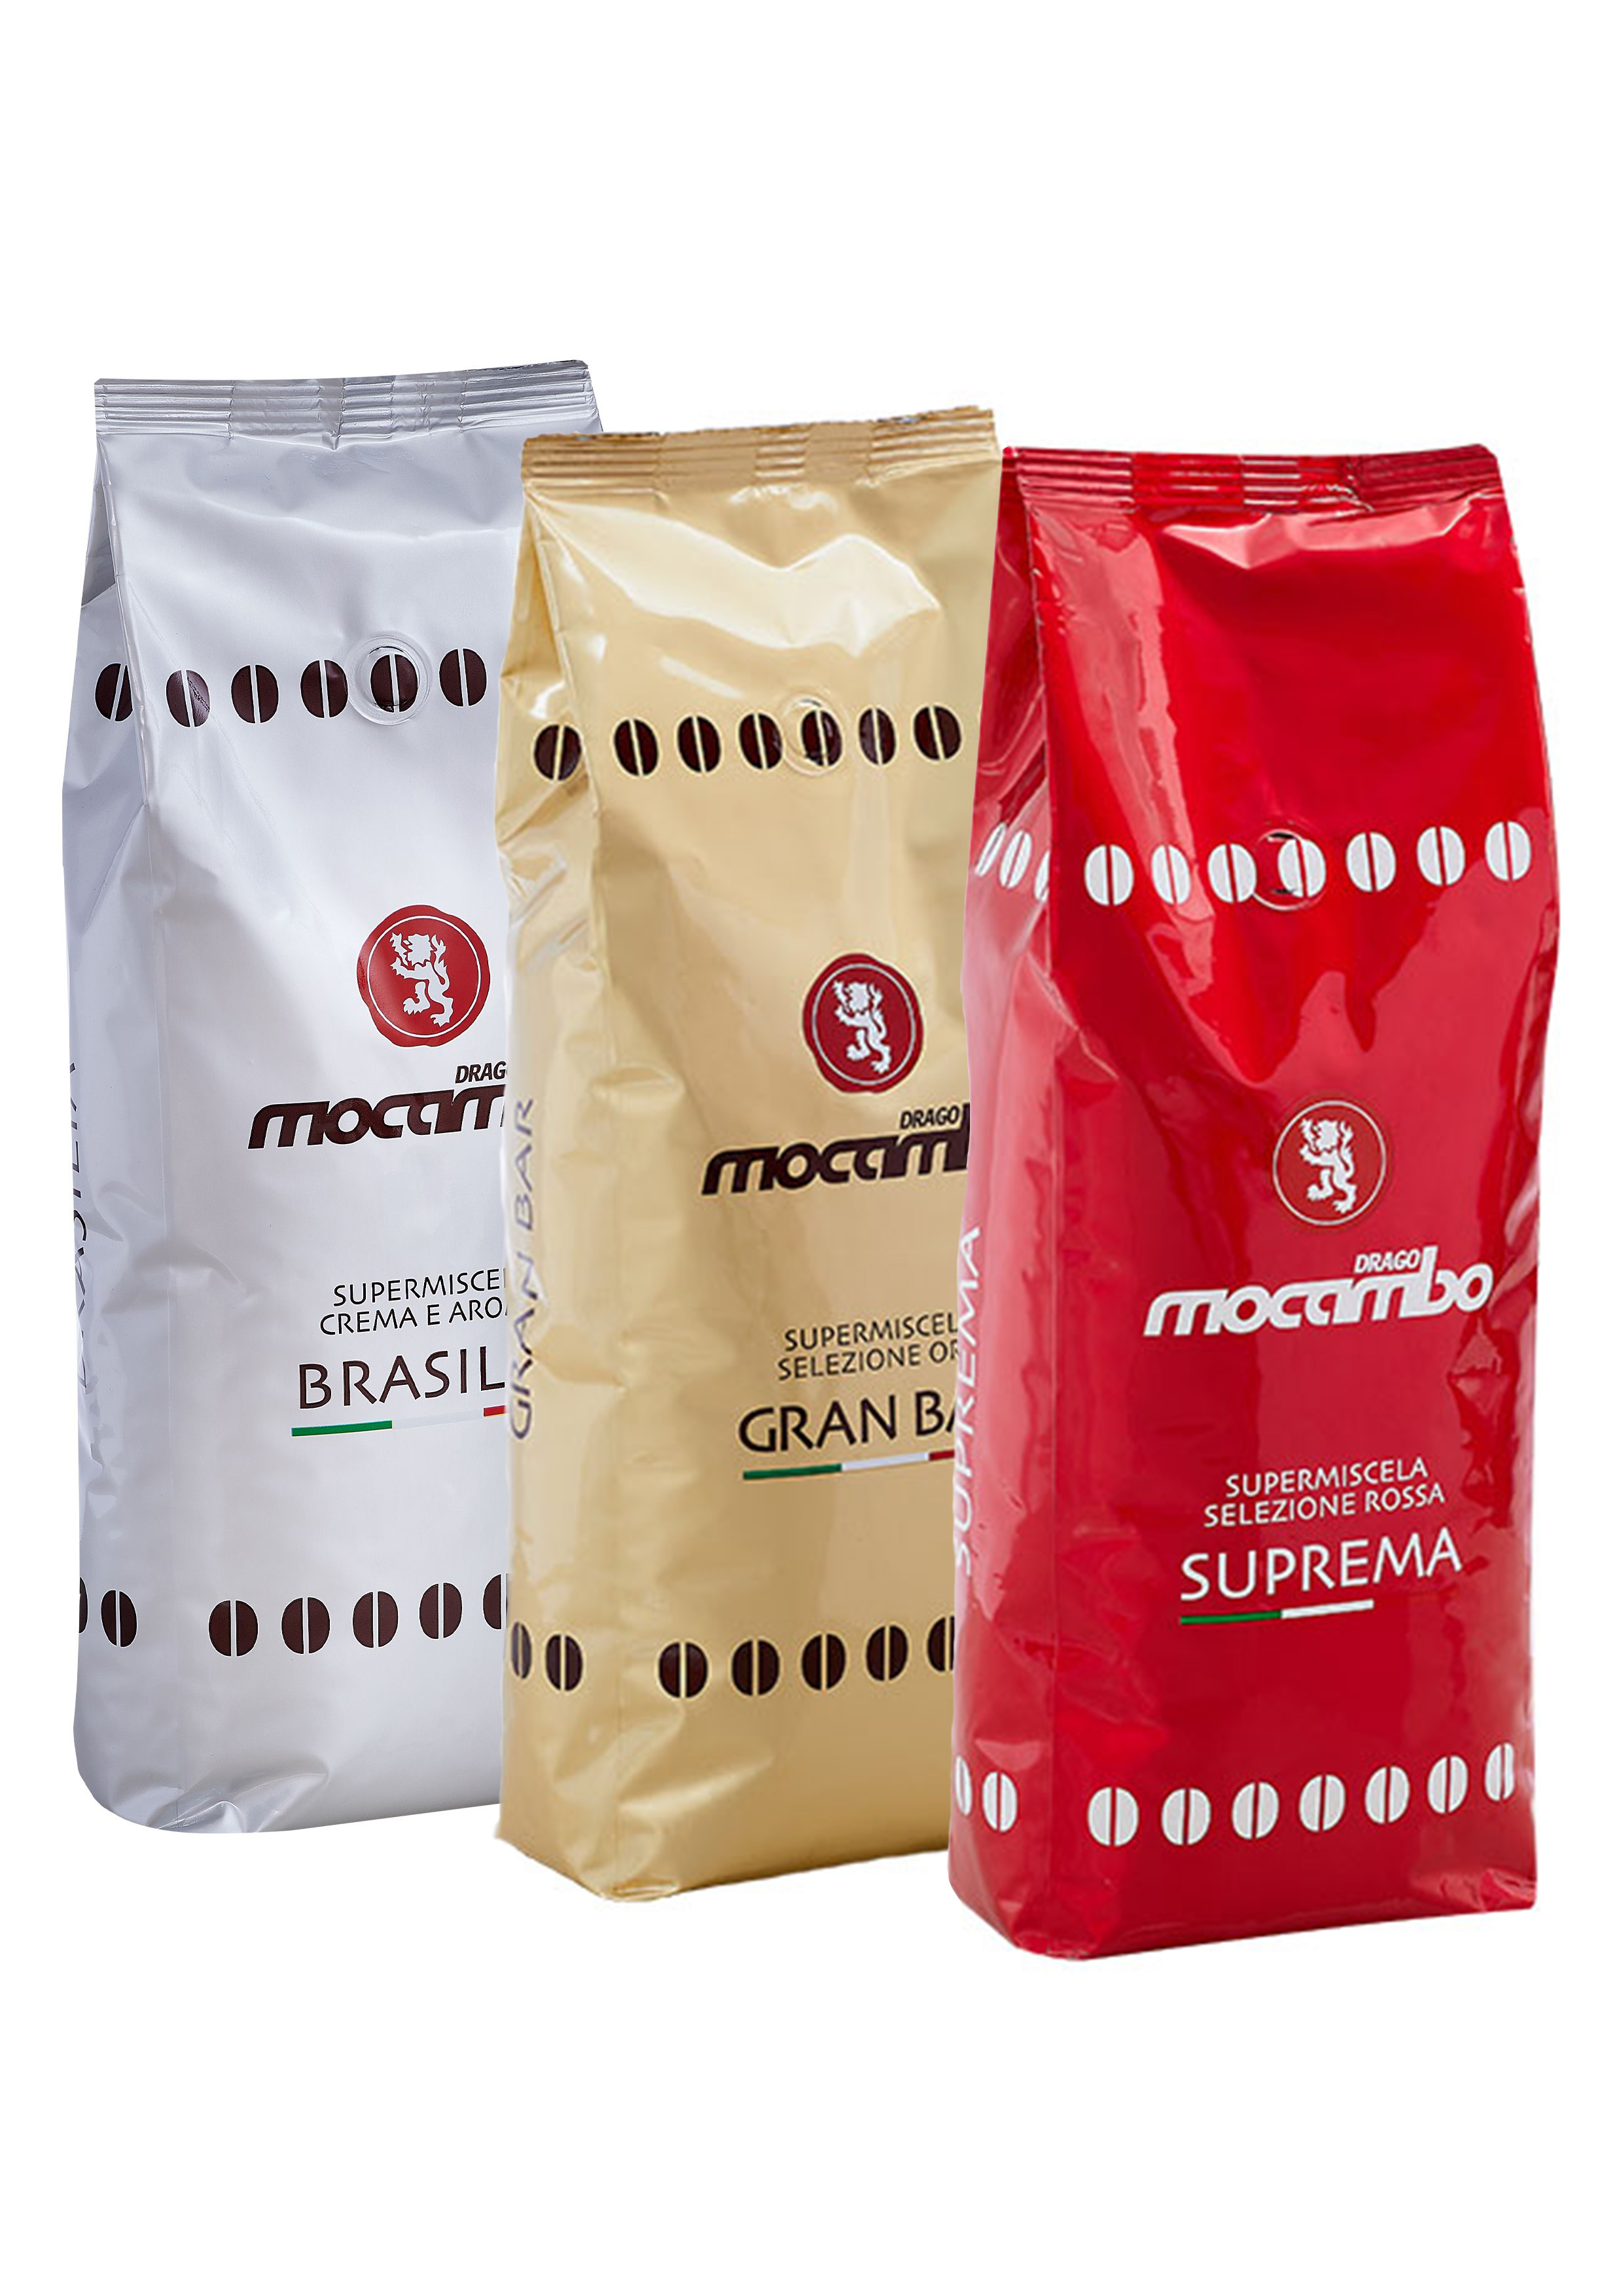 Mocambo Bohnen Probier-Set (3 x 1 kg) + Kaffeebecher Gratis